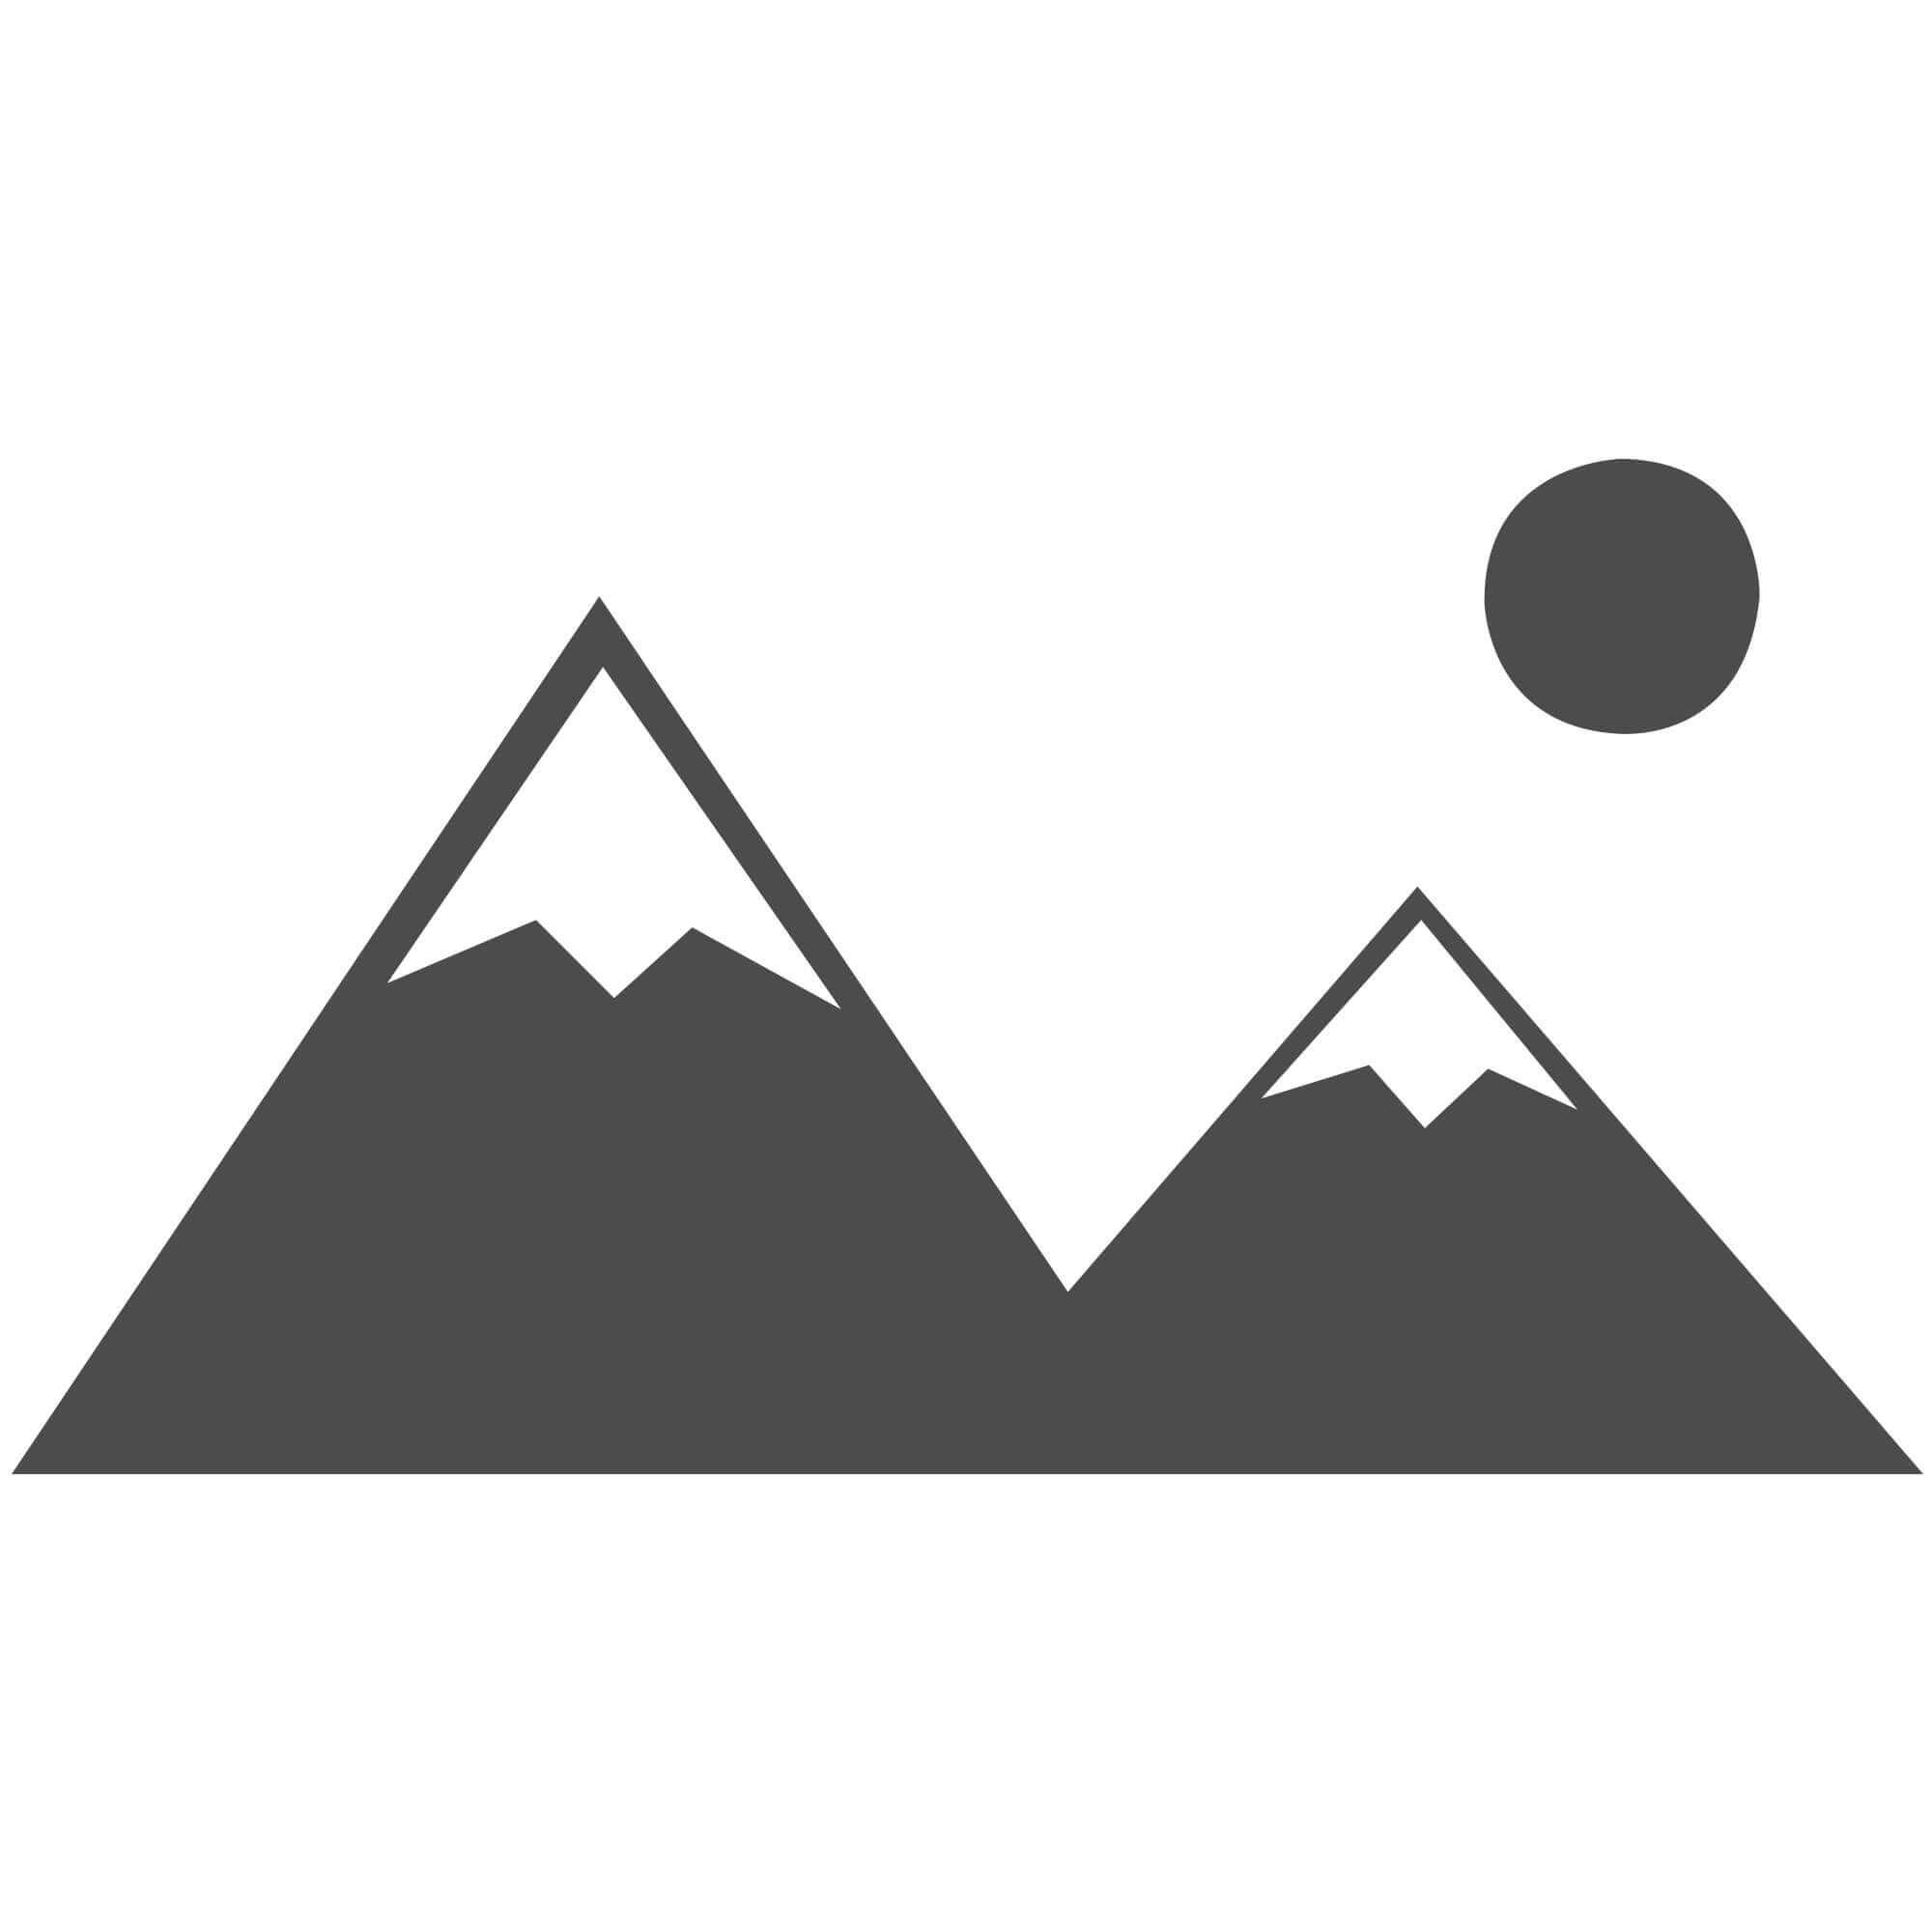 "Barada Damascus Rug - Grey - Size 120 x 170 cm (4' x 5'7"")"